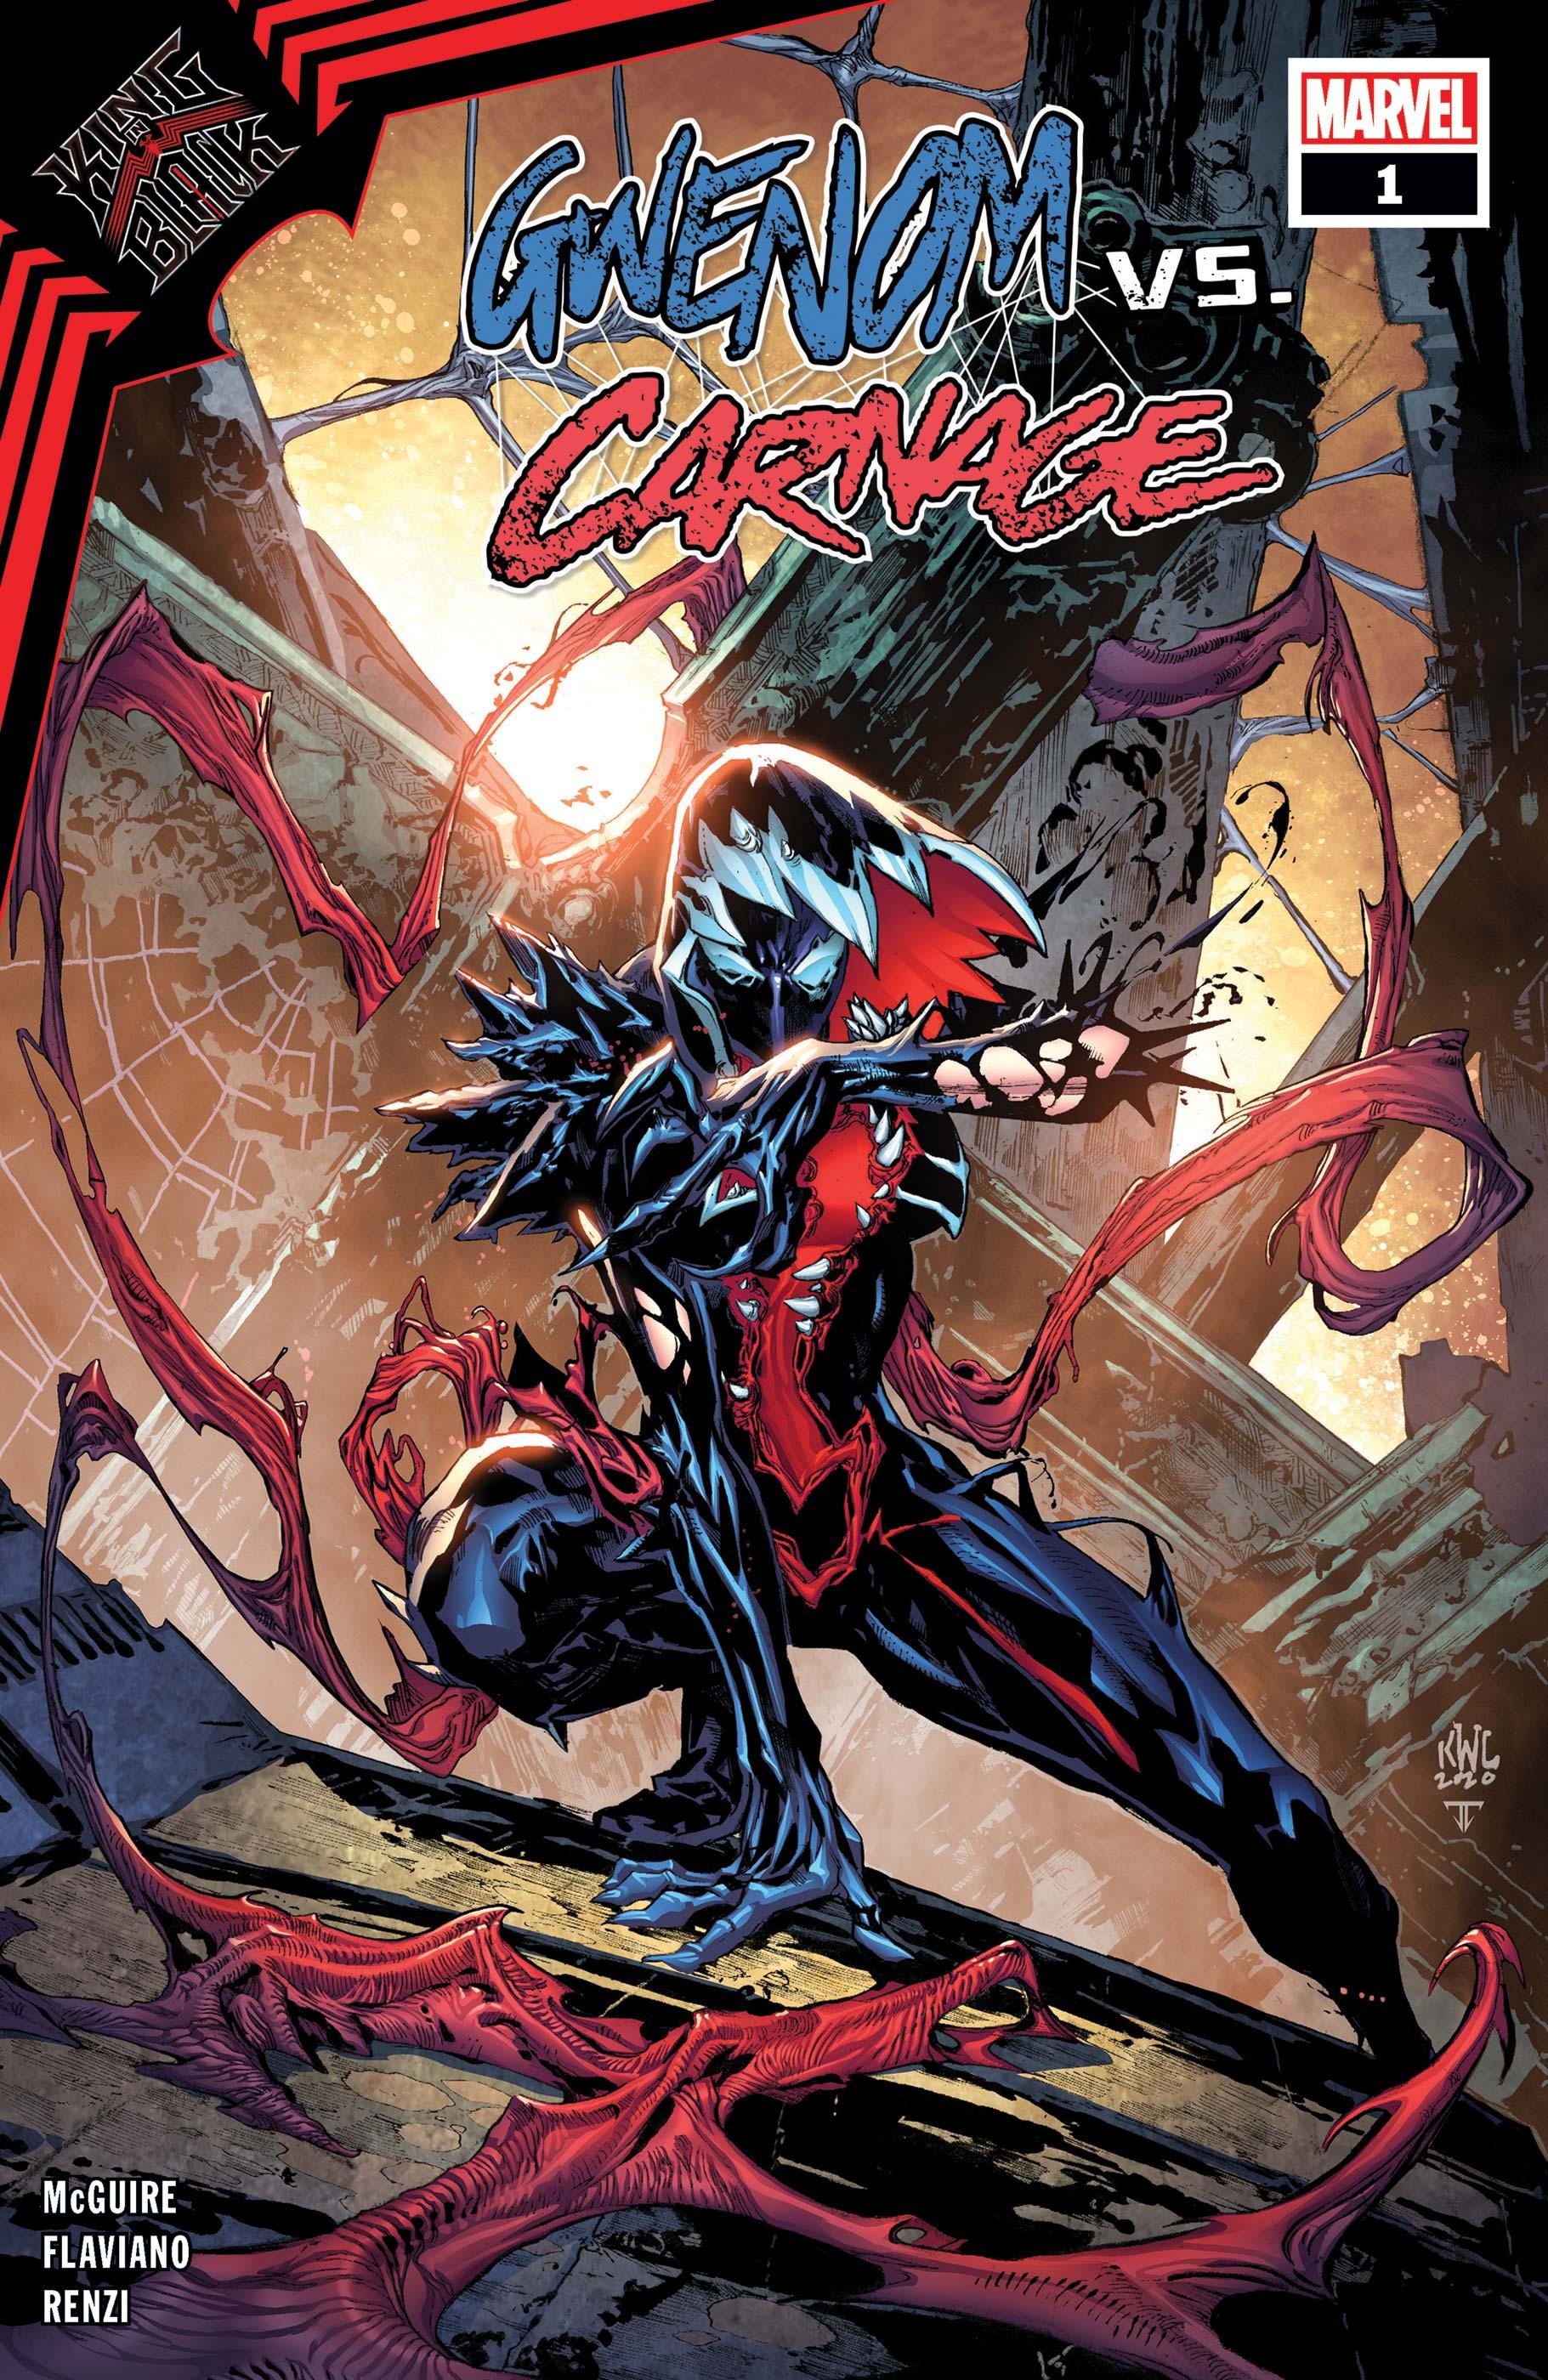 King in Black: Gwenom Vs. Carnage (2021) #1